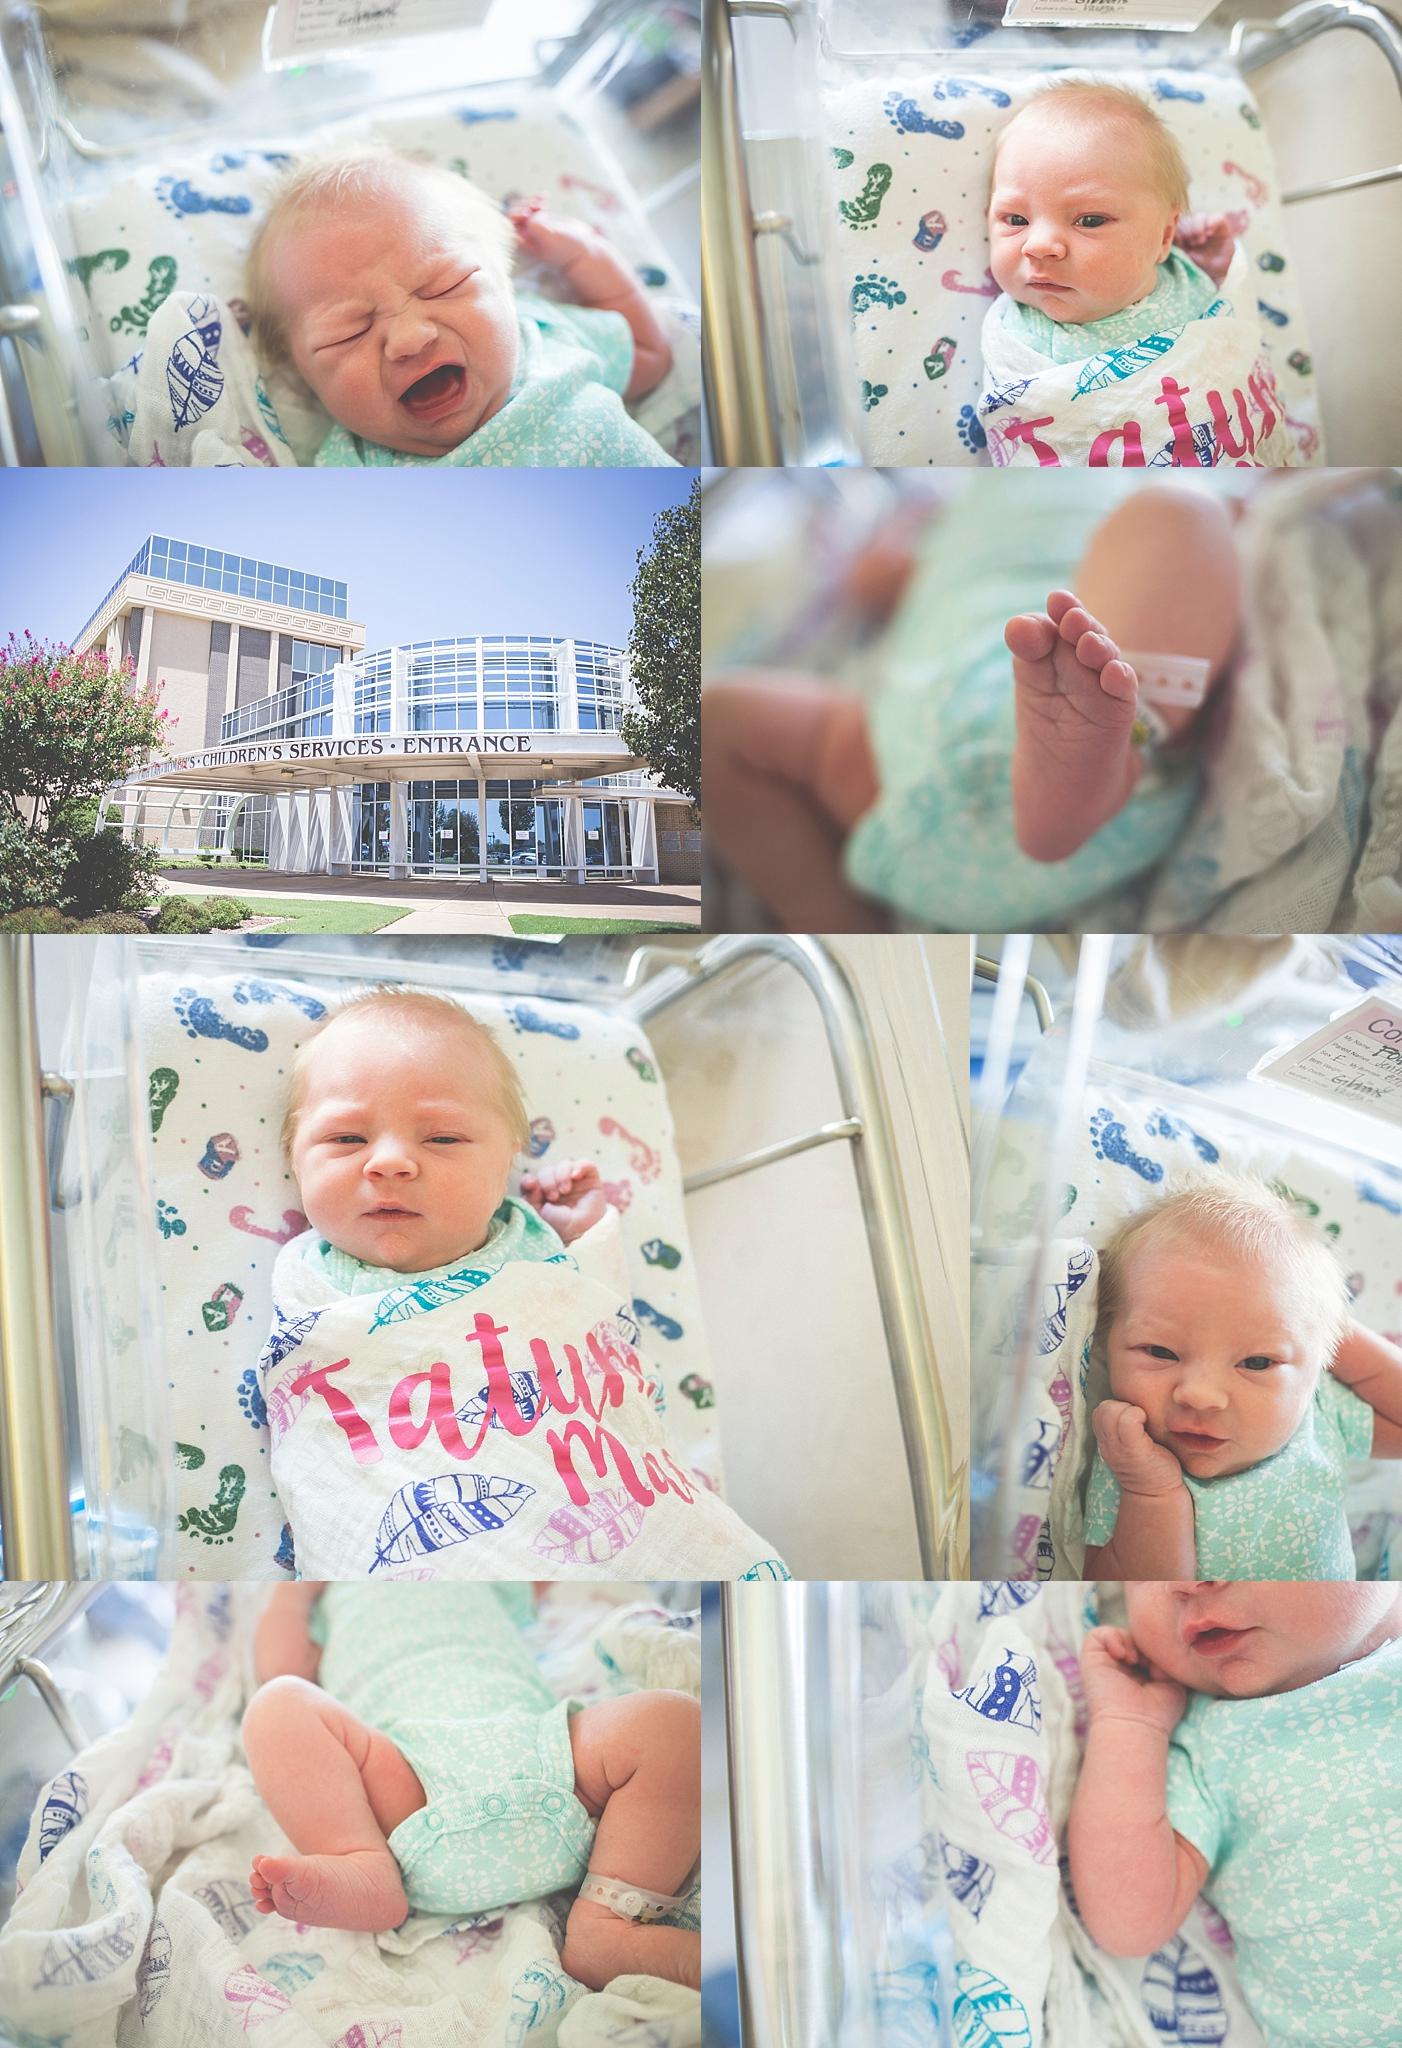 hospital-newborn-girl-photos-jefferson-city-columbia-como-missouri-studio-newborn-baby-photography.jpg